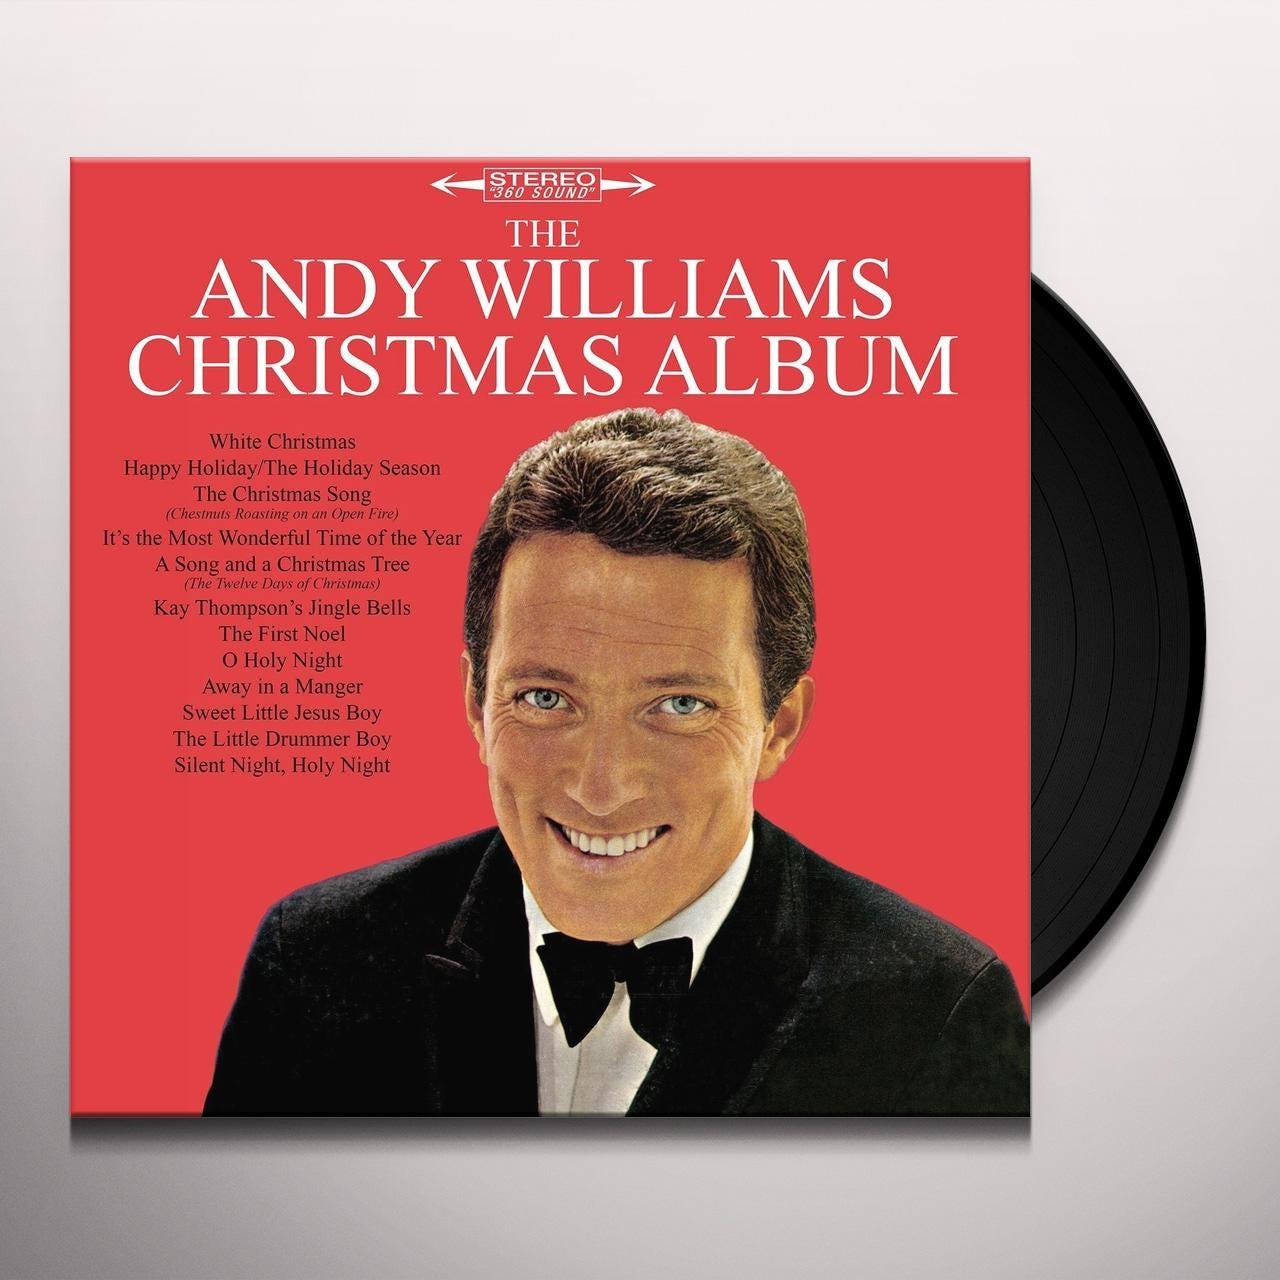 Andy Williams Christmas.Andy Williams Christmas Album Vinyl Record